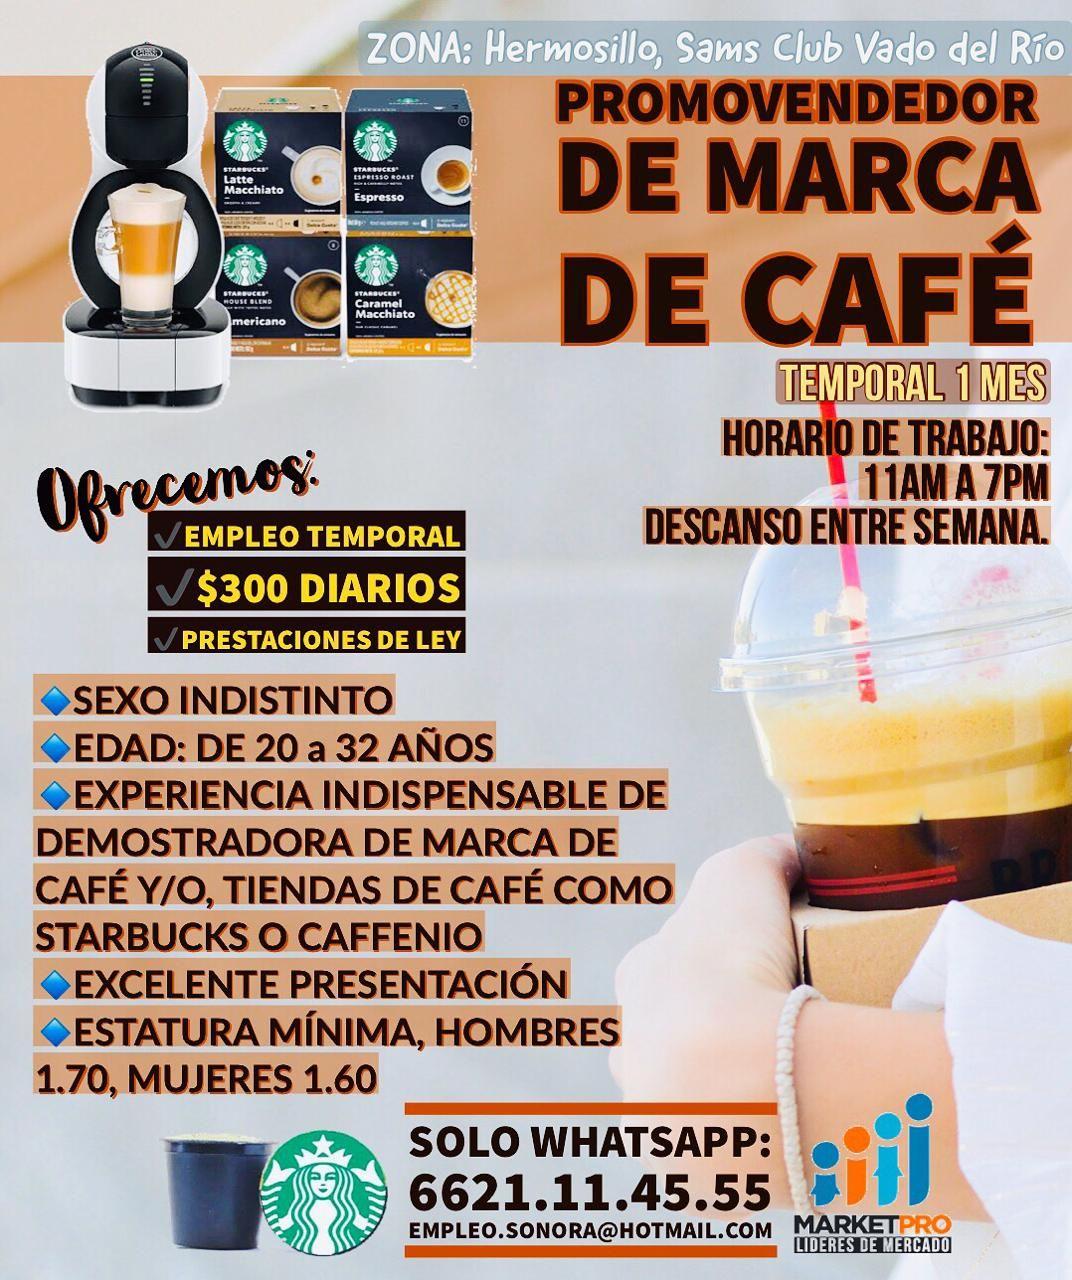 Promotor rhojo market pro café empleo